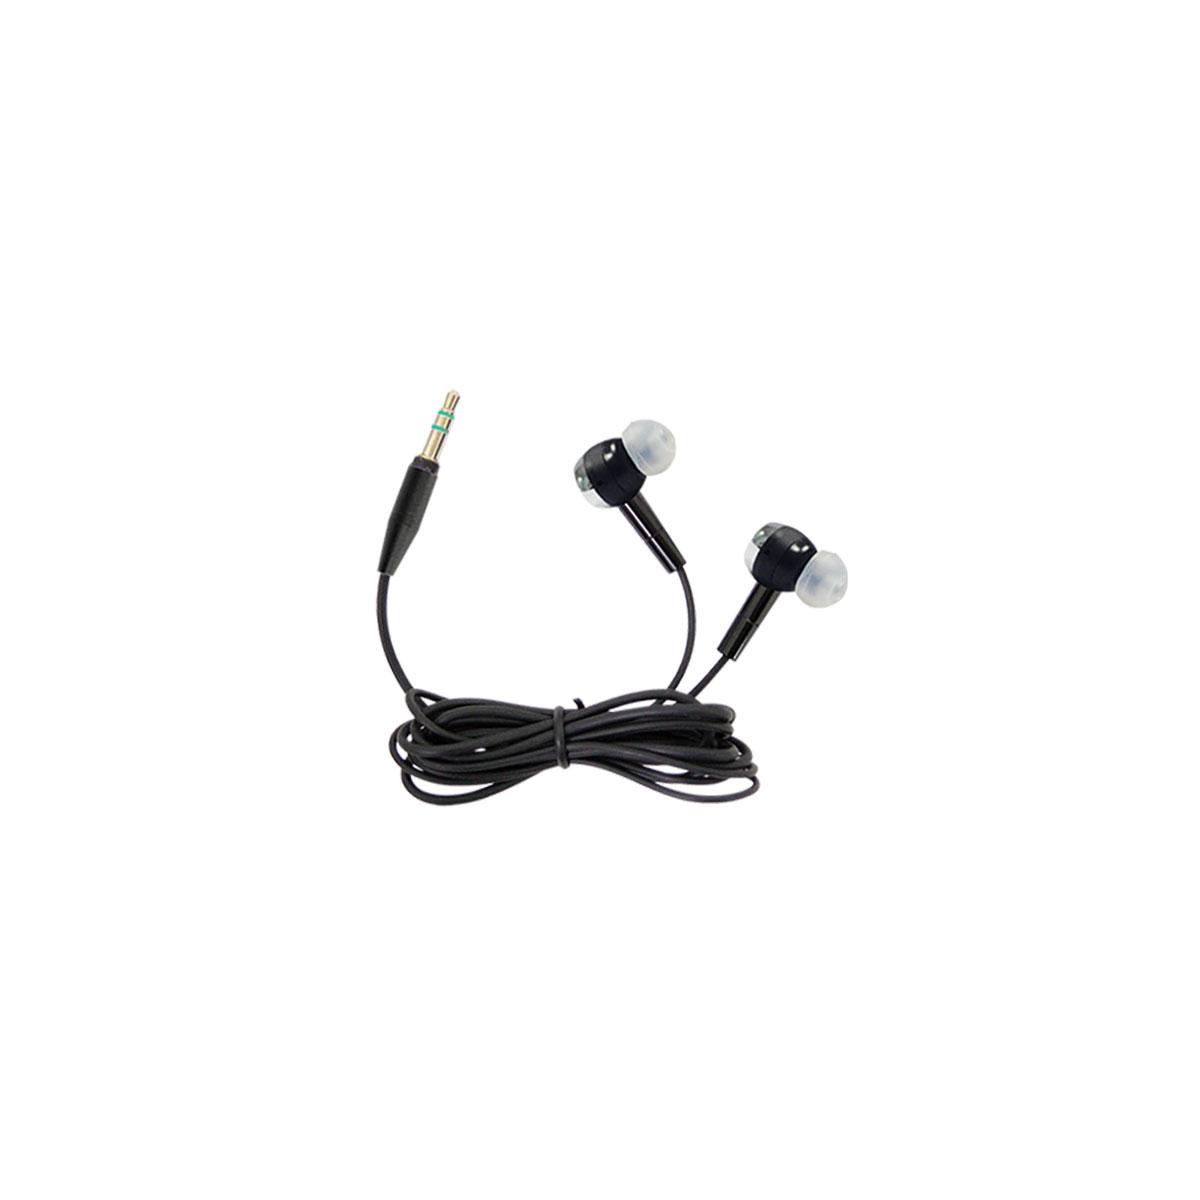 Receptor s/ Fio c/ Fone de Ouvido In-ear C-IE6-UR - Compatível